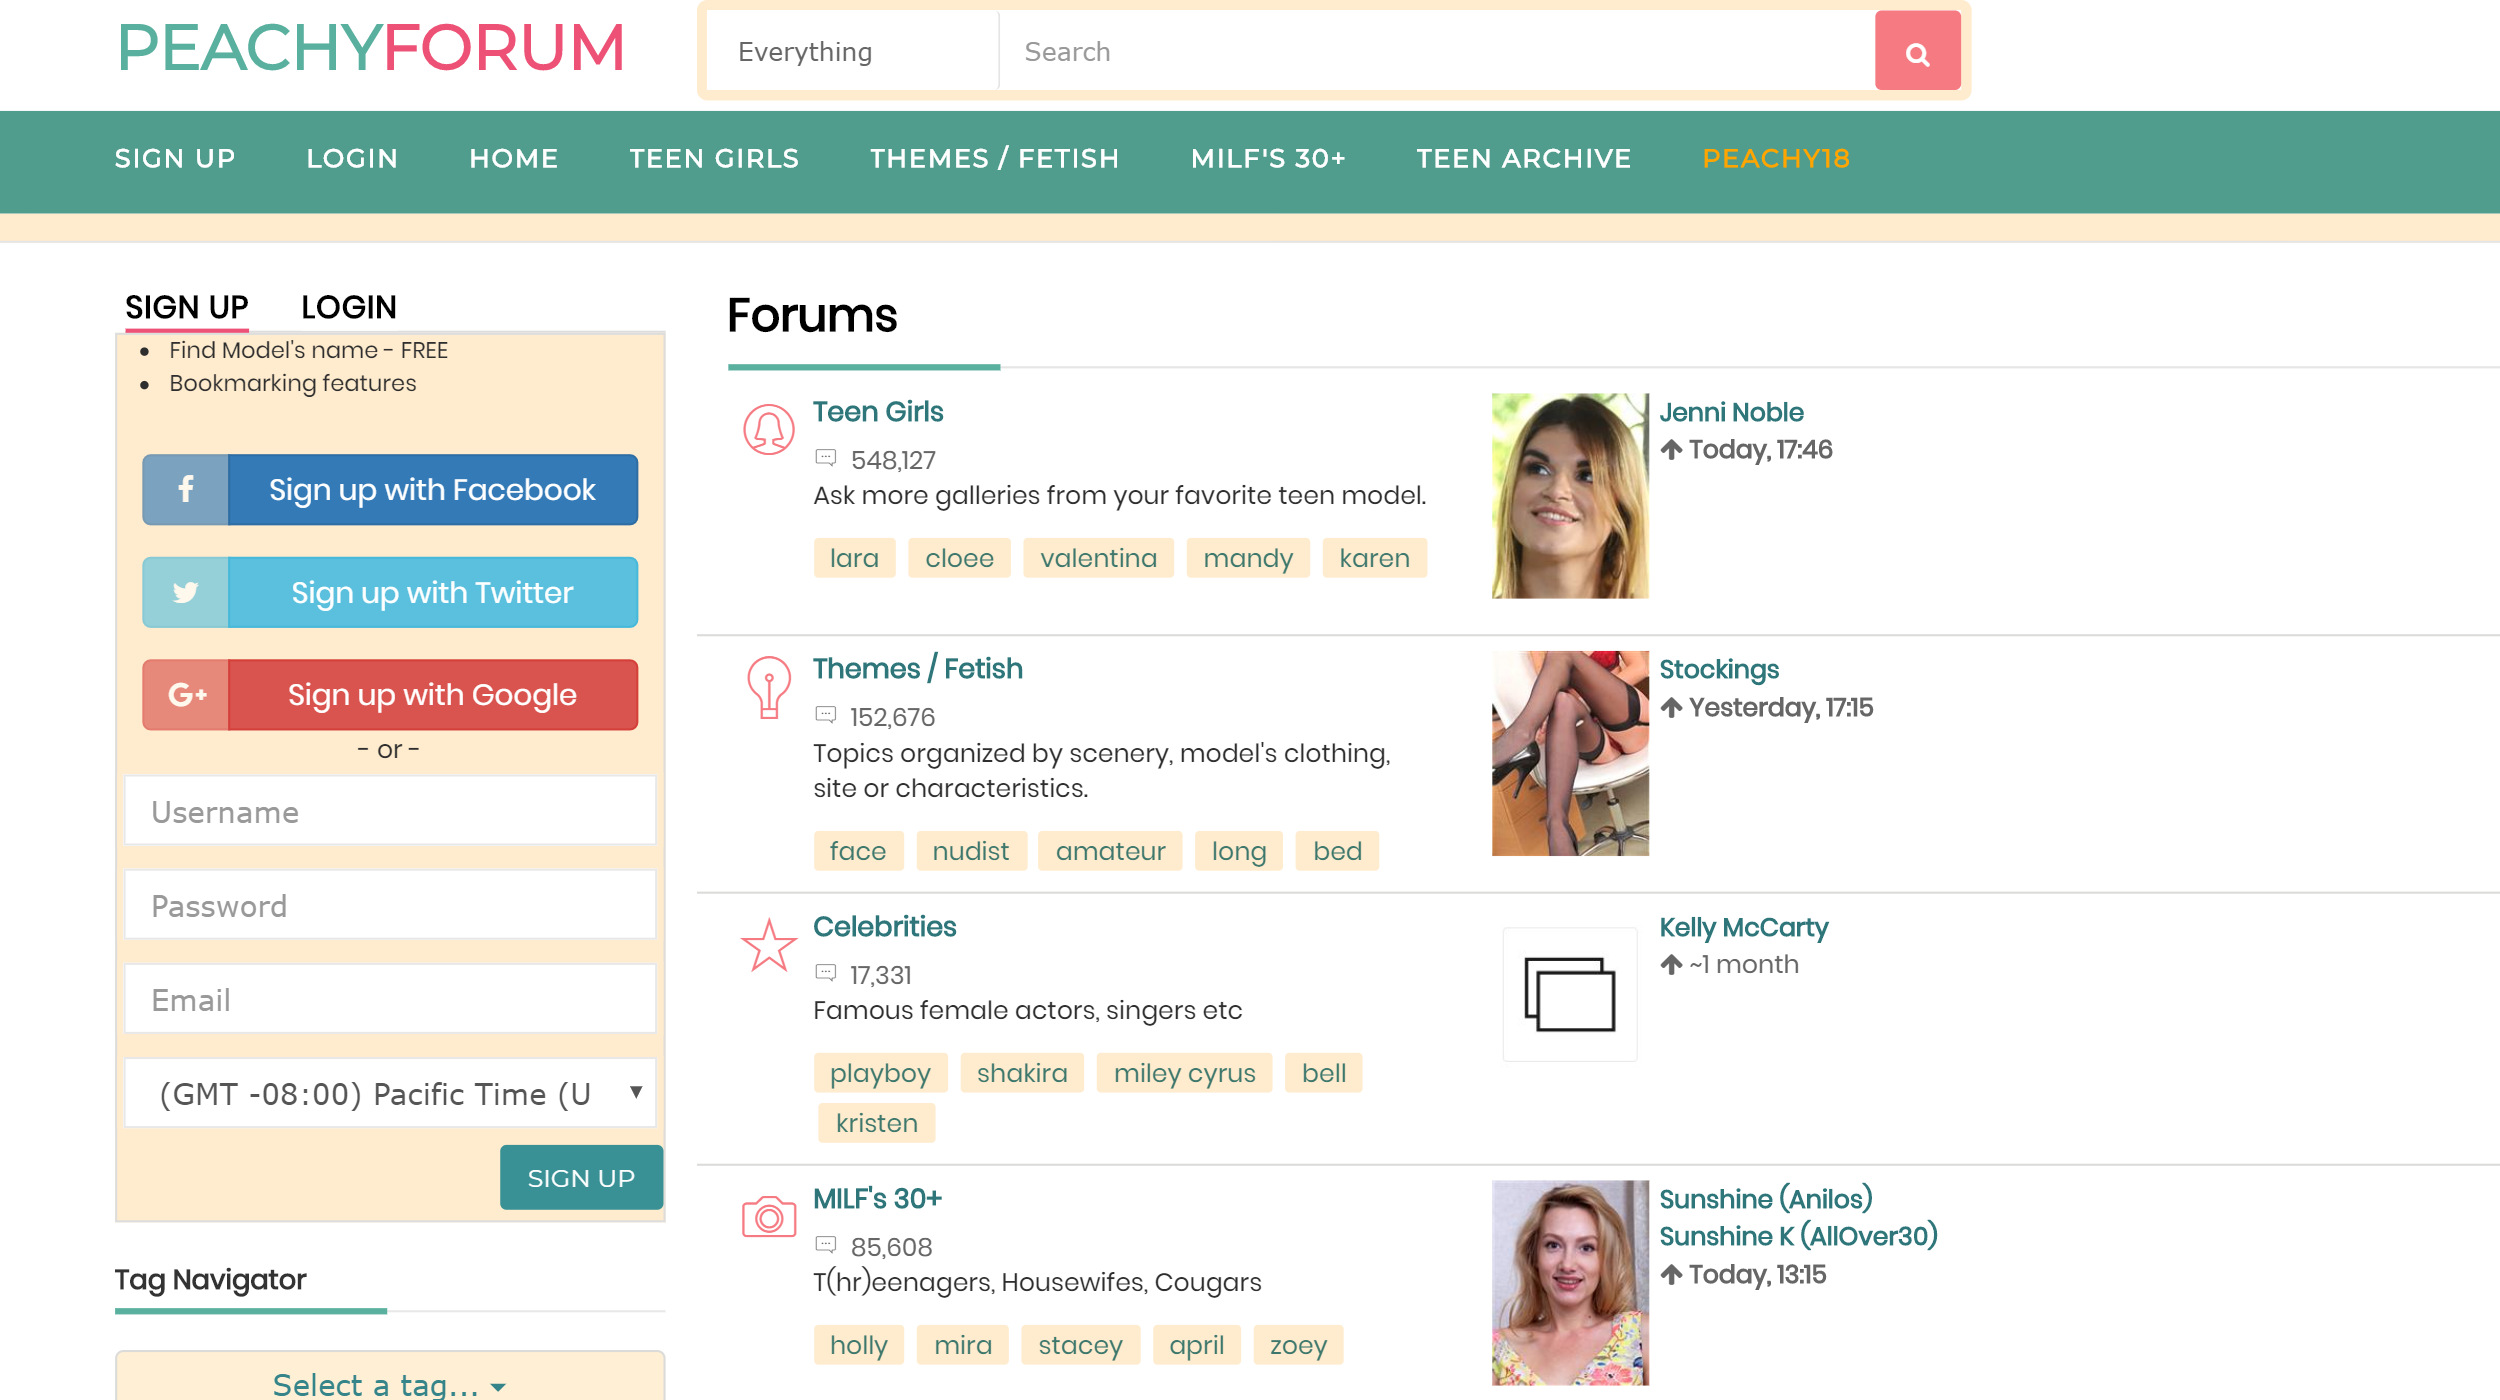 Peachy Forum